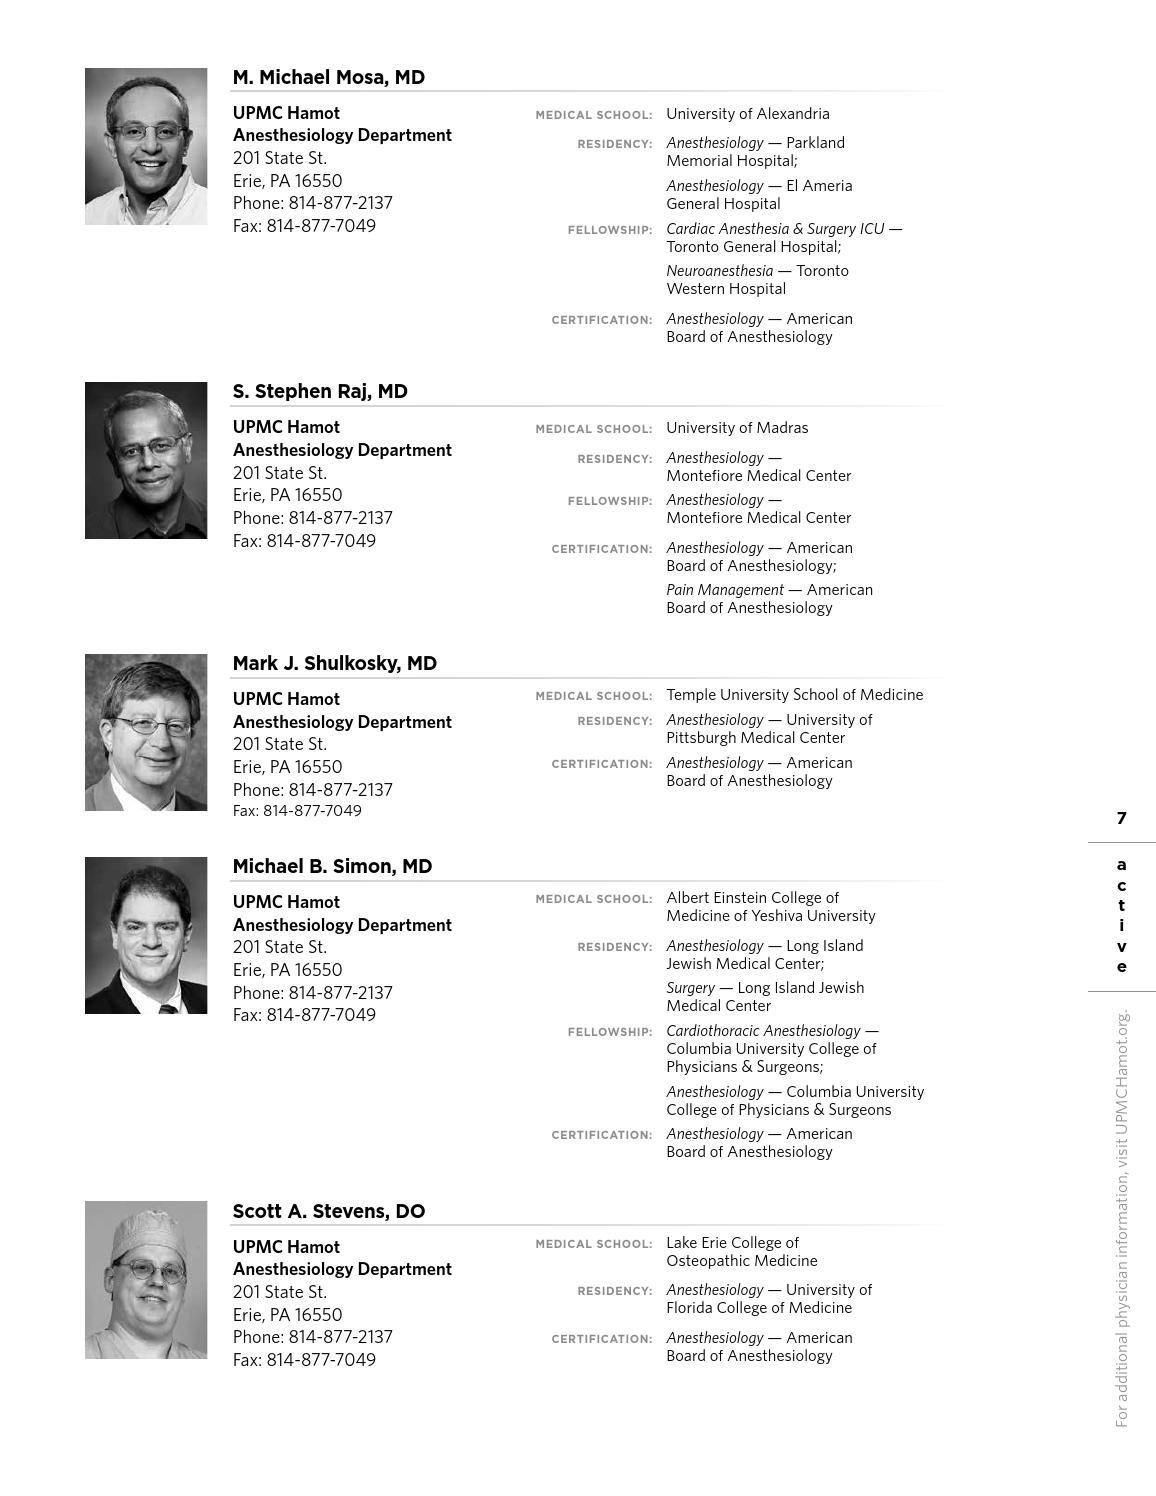 UPMC Hamot Physician Directory 2014-2015 by tungsten